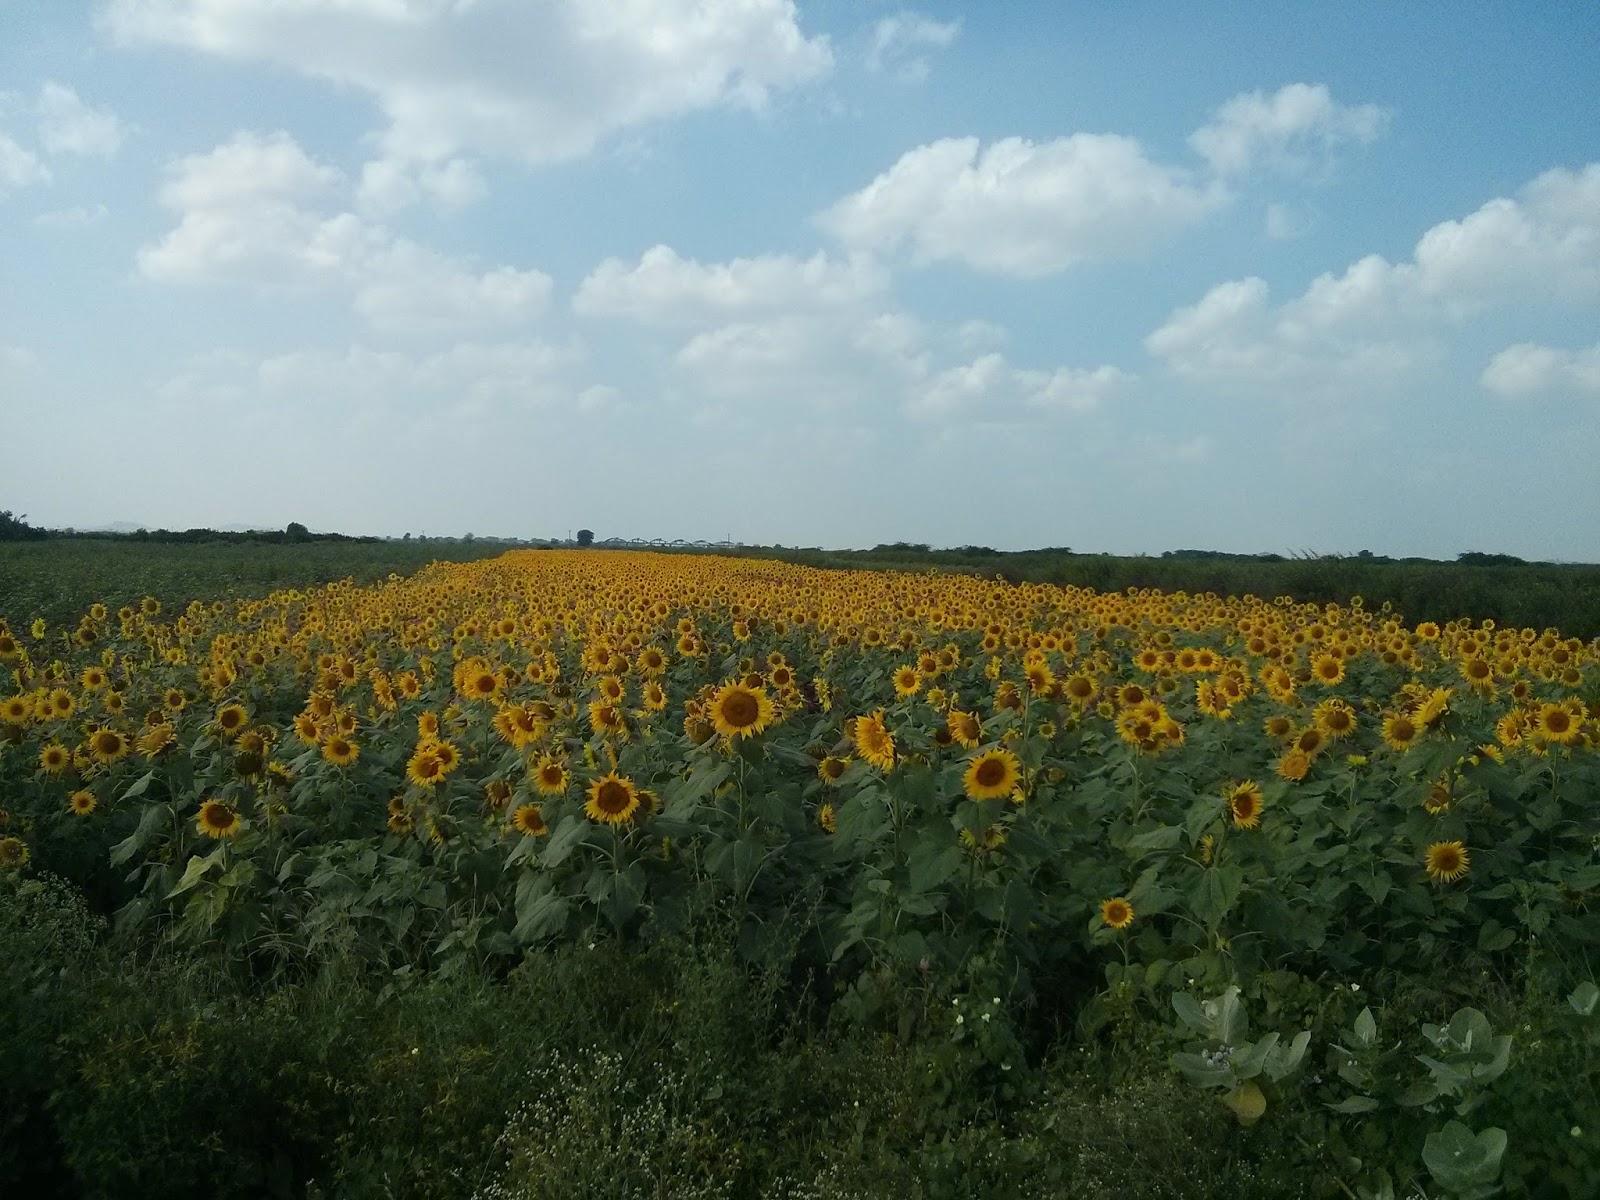 sunflower fields 2 by - photo #10